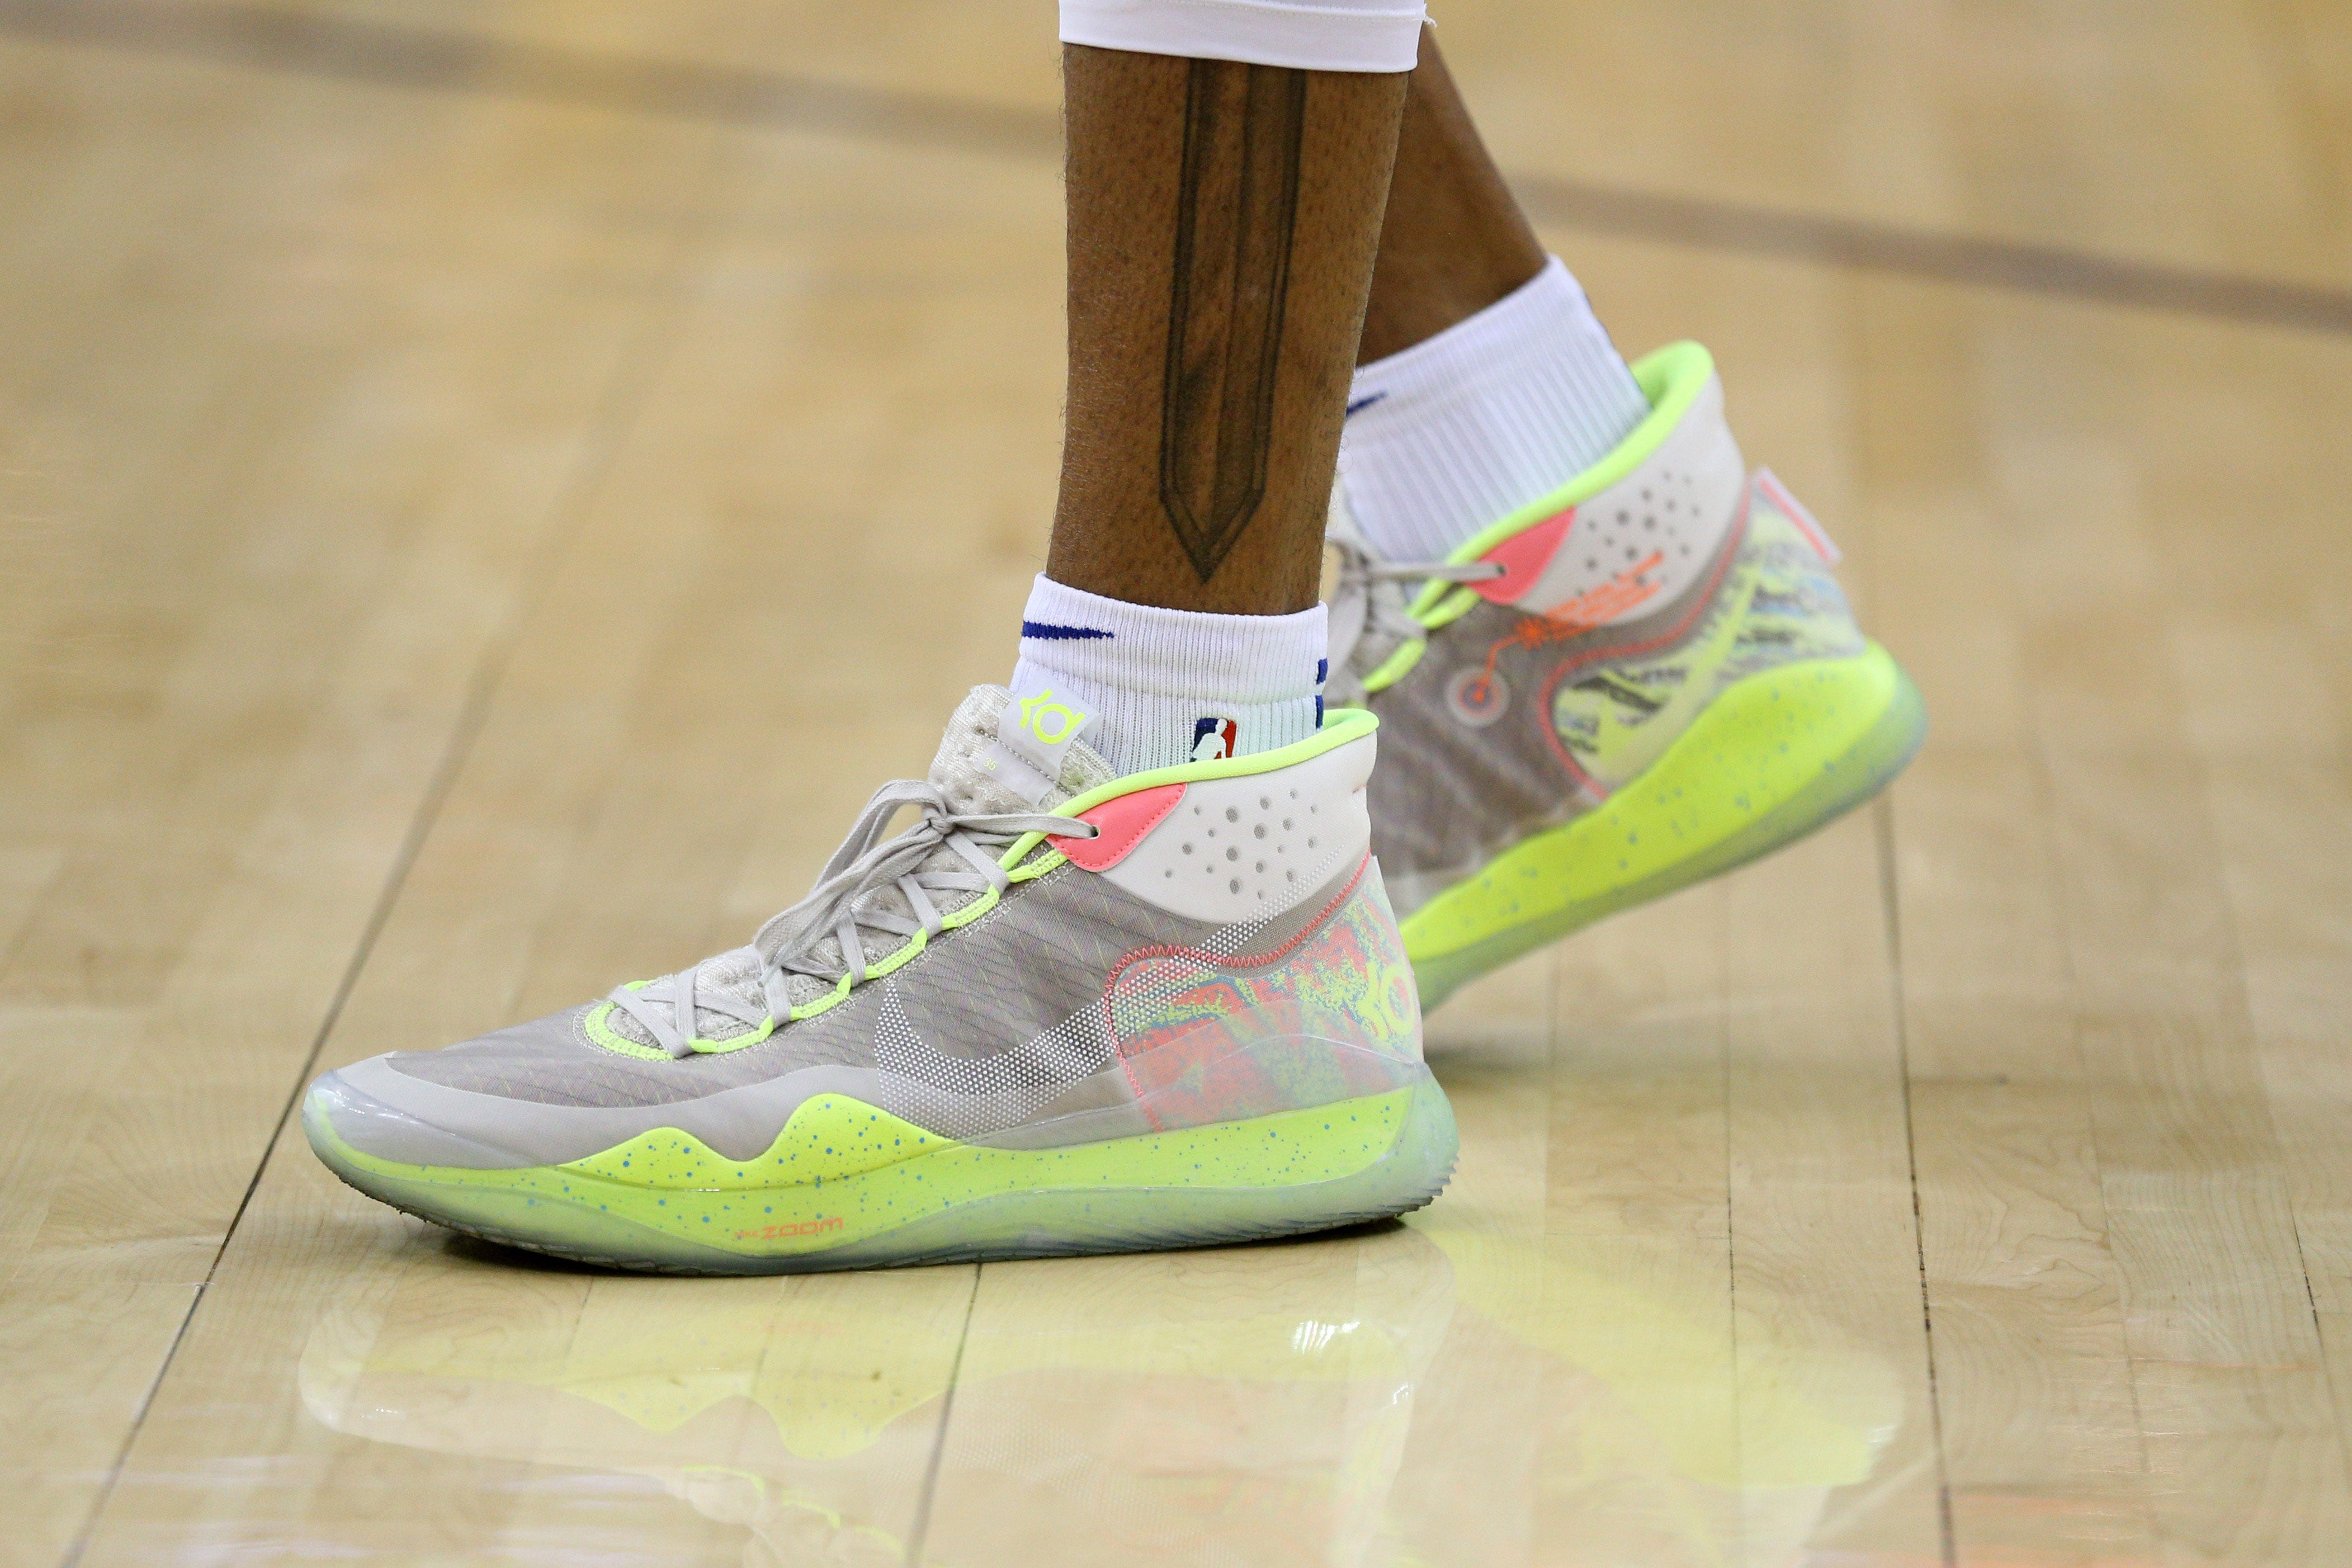 48829a4f04ad NBA shoes  Coolest kicks of the 2018-19 season